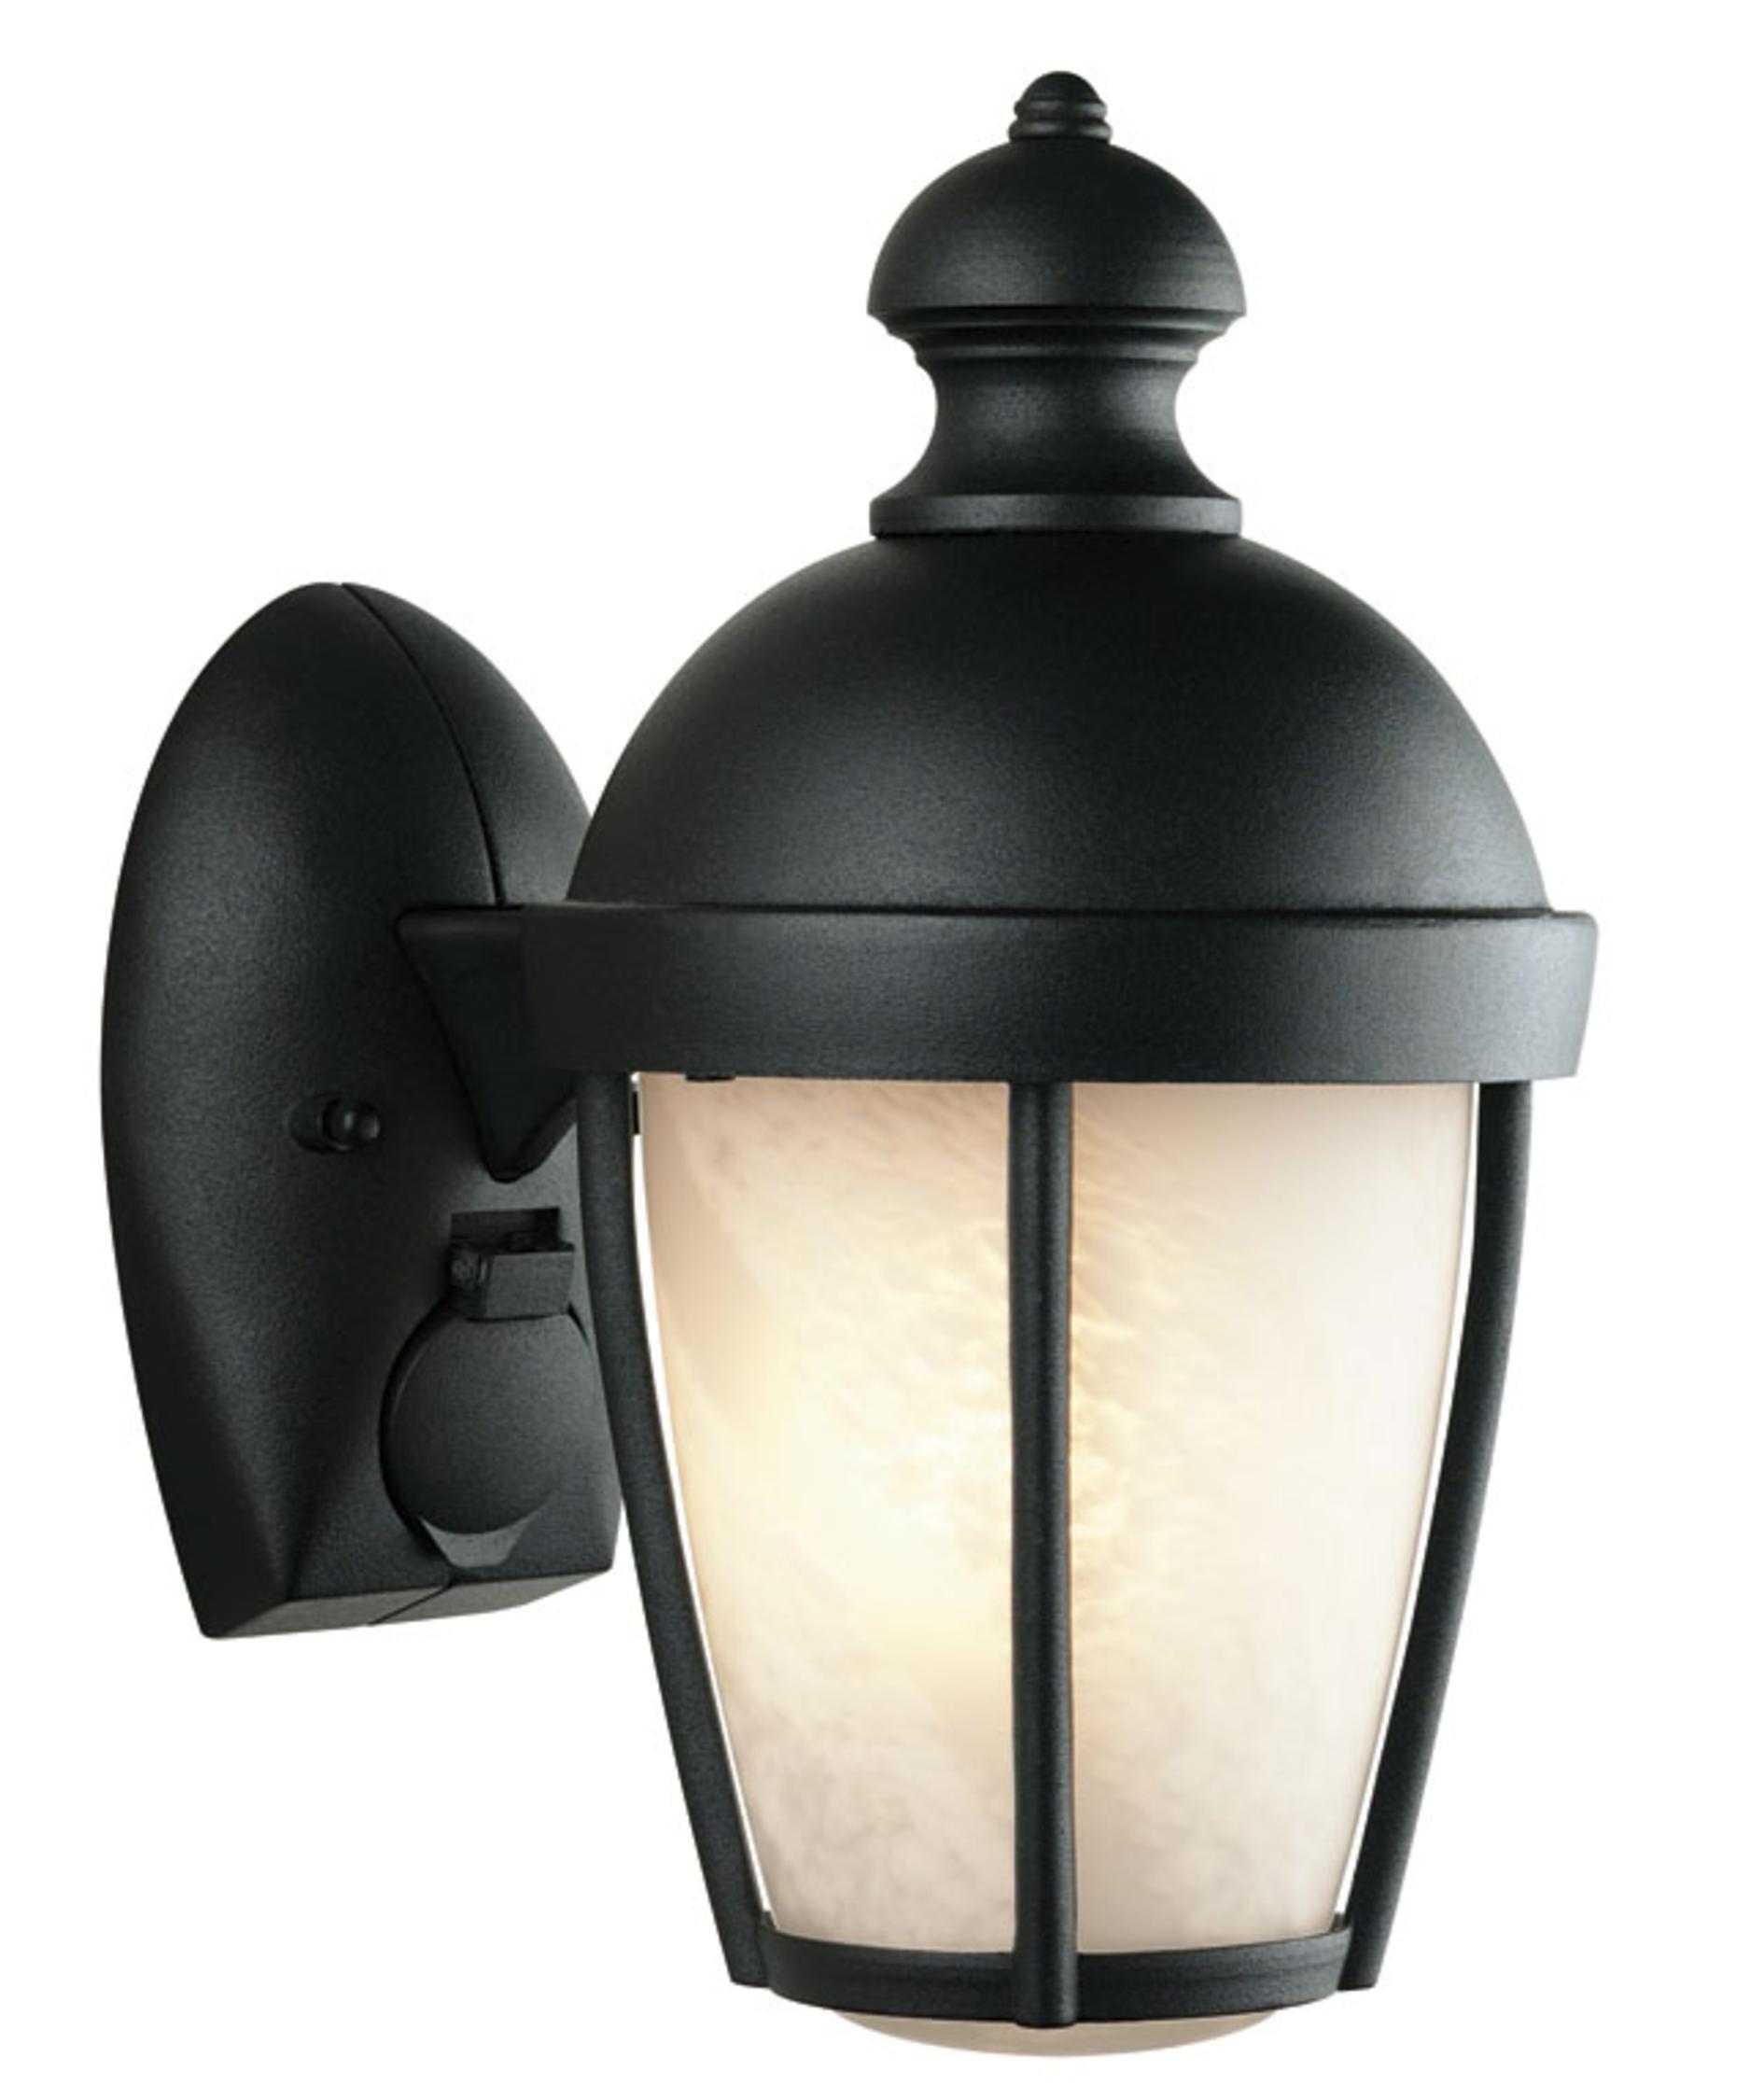 Forecast F3128 Hide A Plug 1 Light Outdoor Wall Light